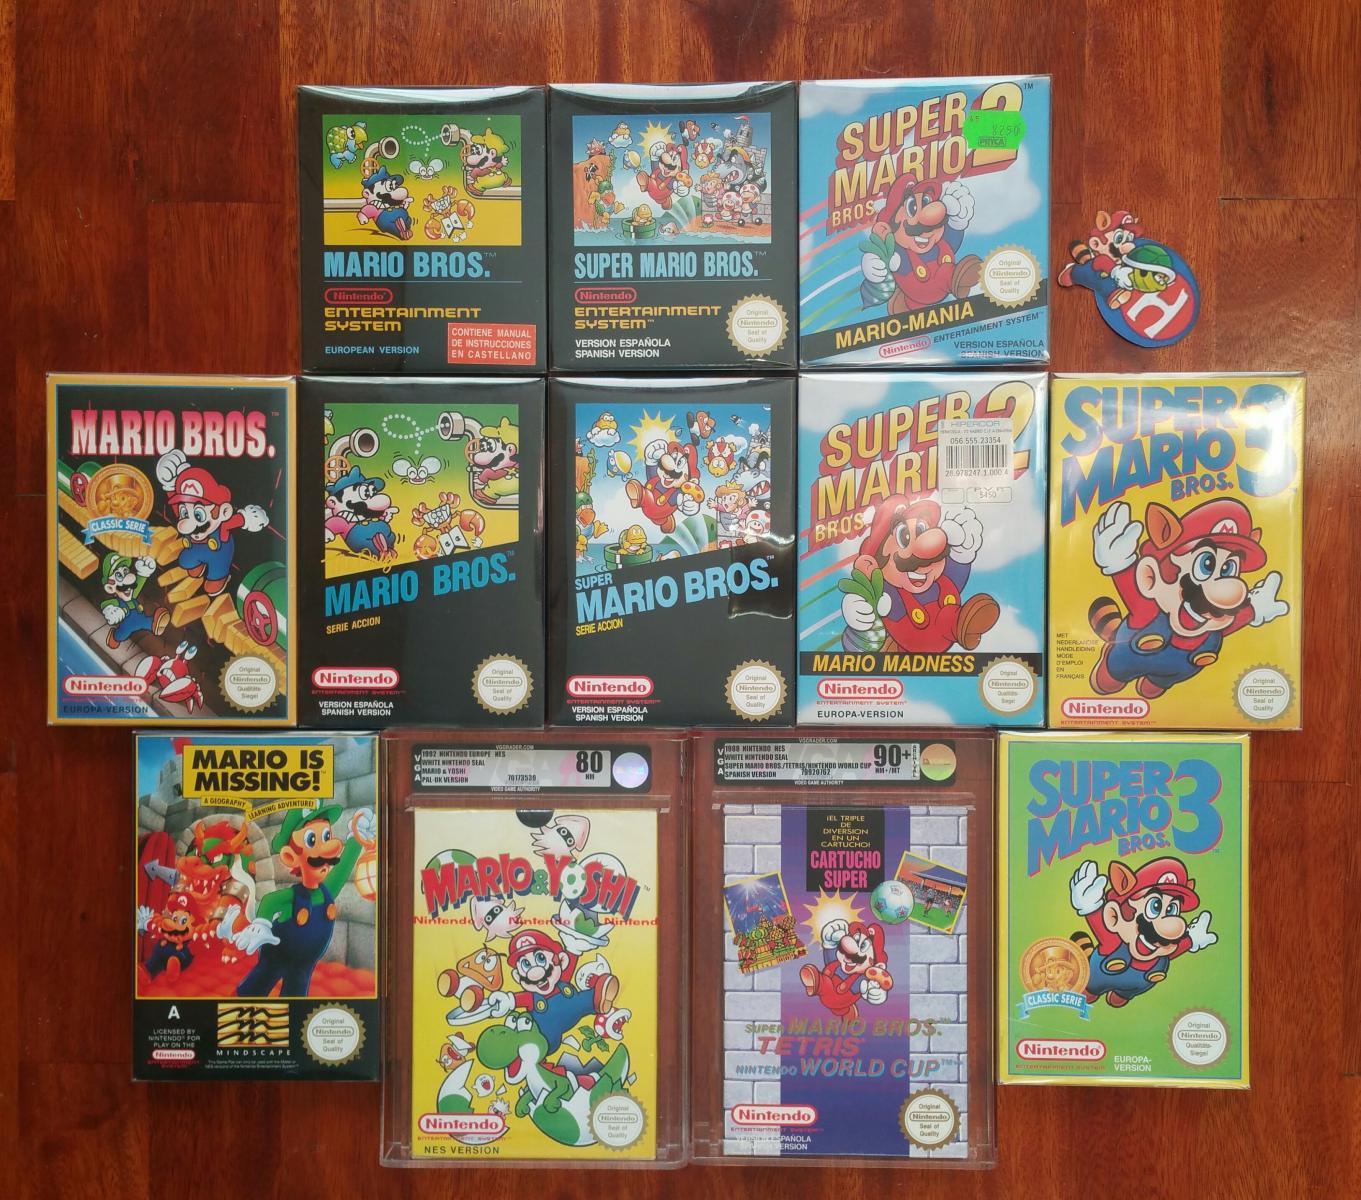 Pequeño homenaje a Mario bros.